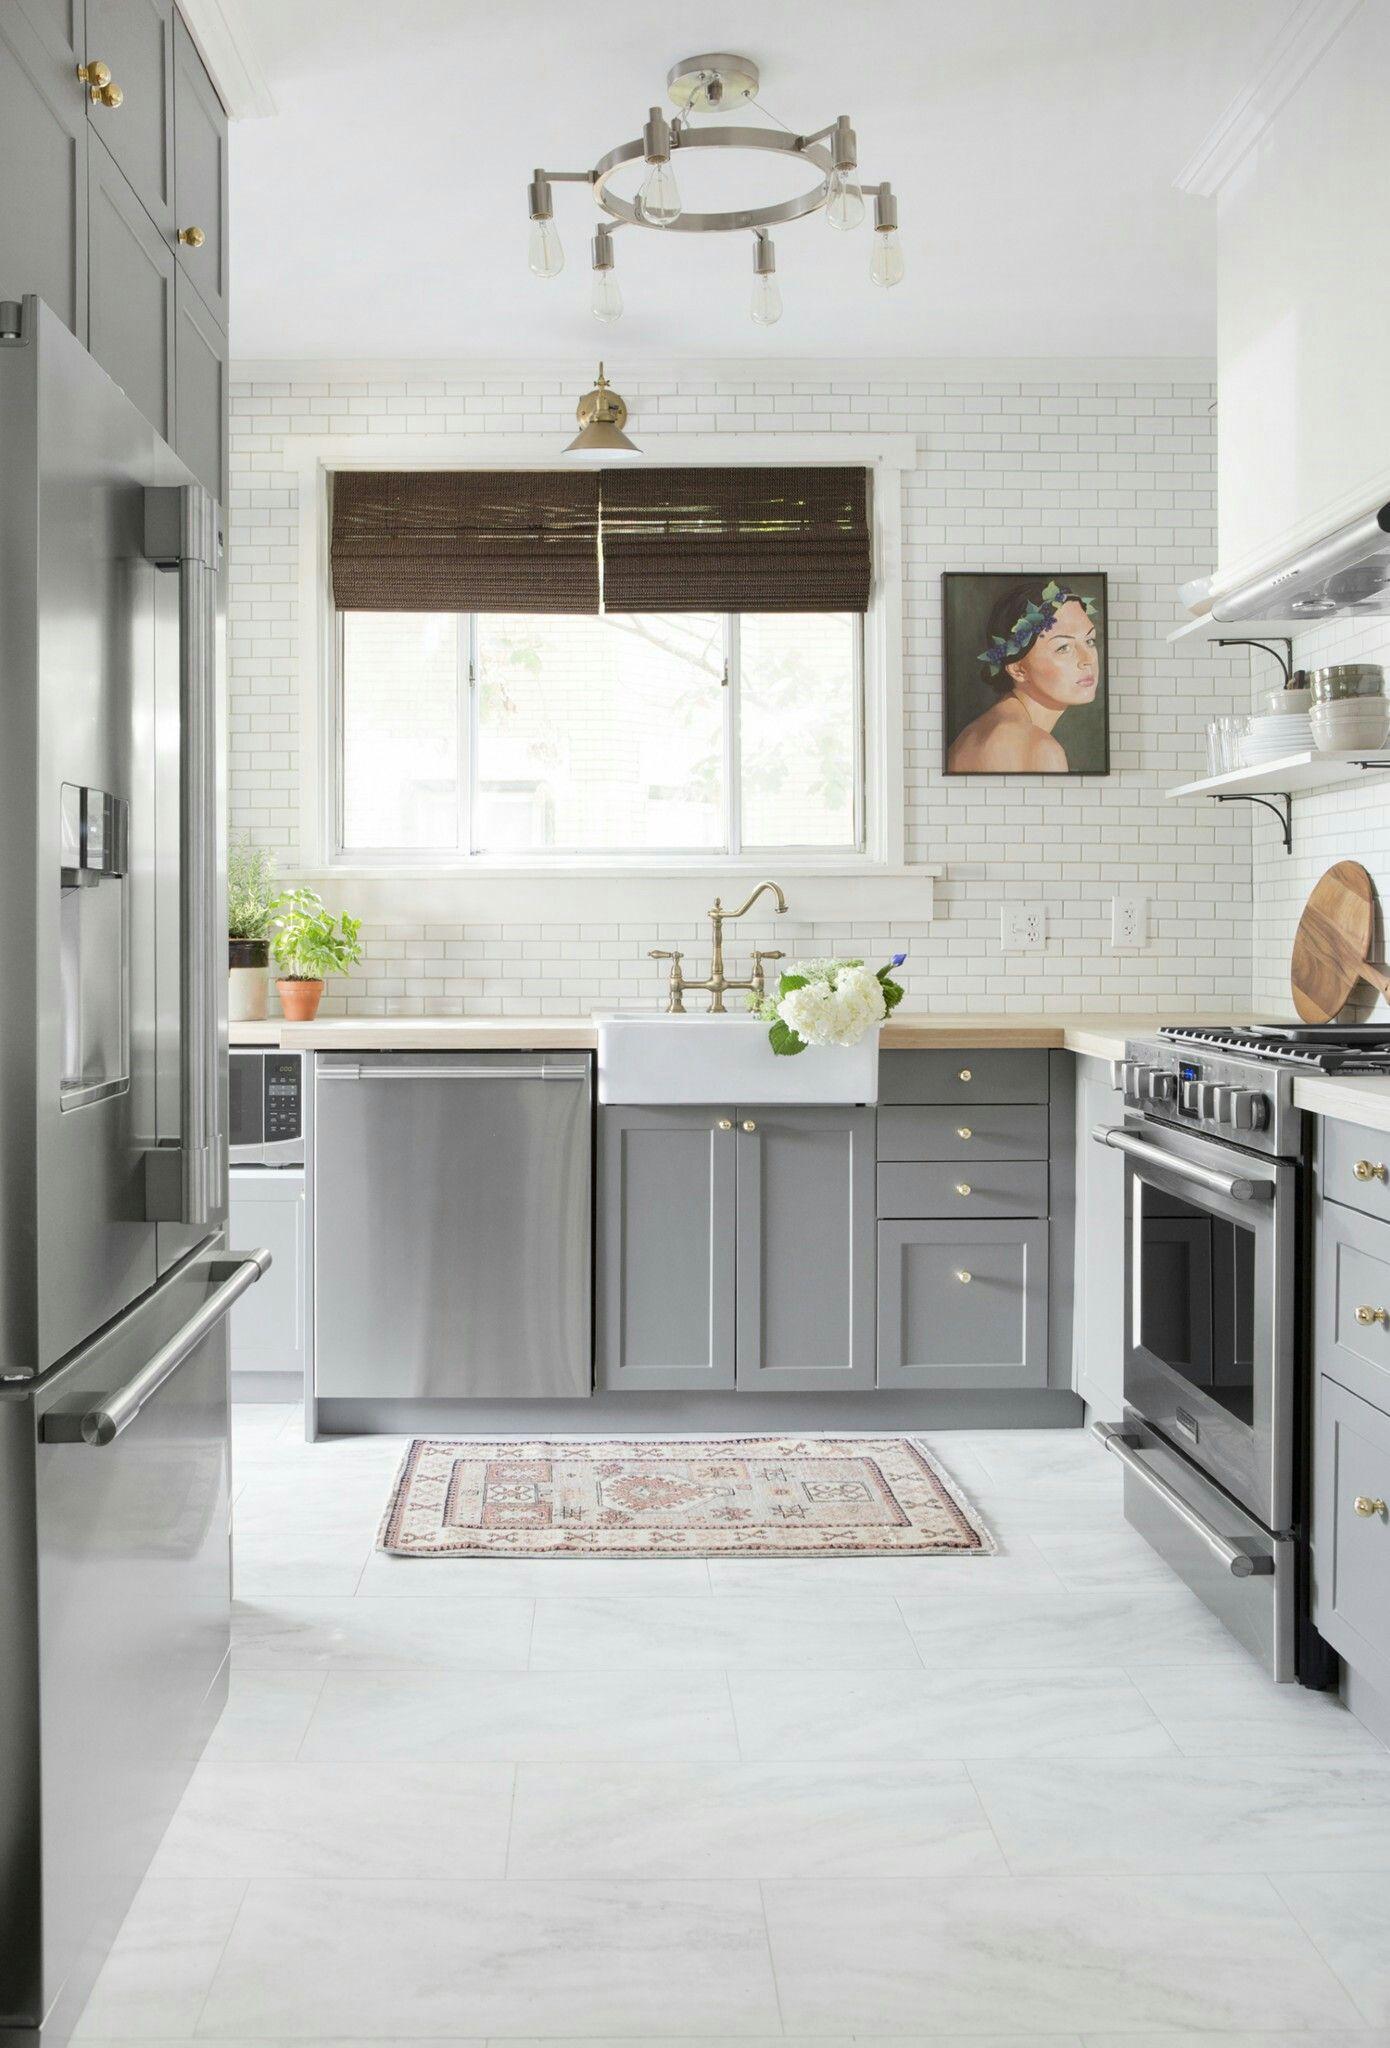 Beautiful And Functional Kitchen With Chris Loves Julia S Cove Shaker Kitchen Decor Inspiration Kitchen Interior Kitchen Renovation